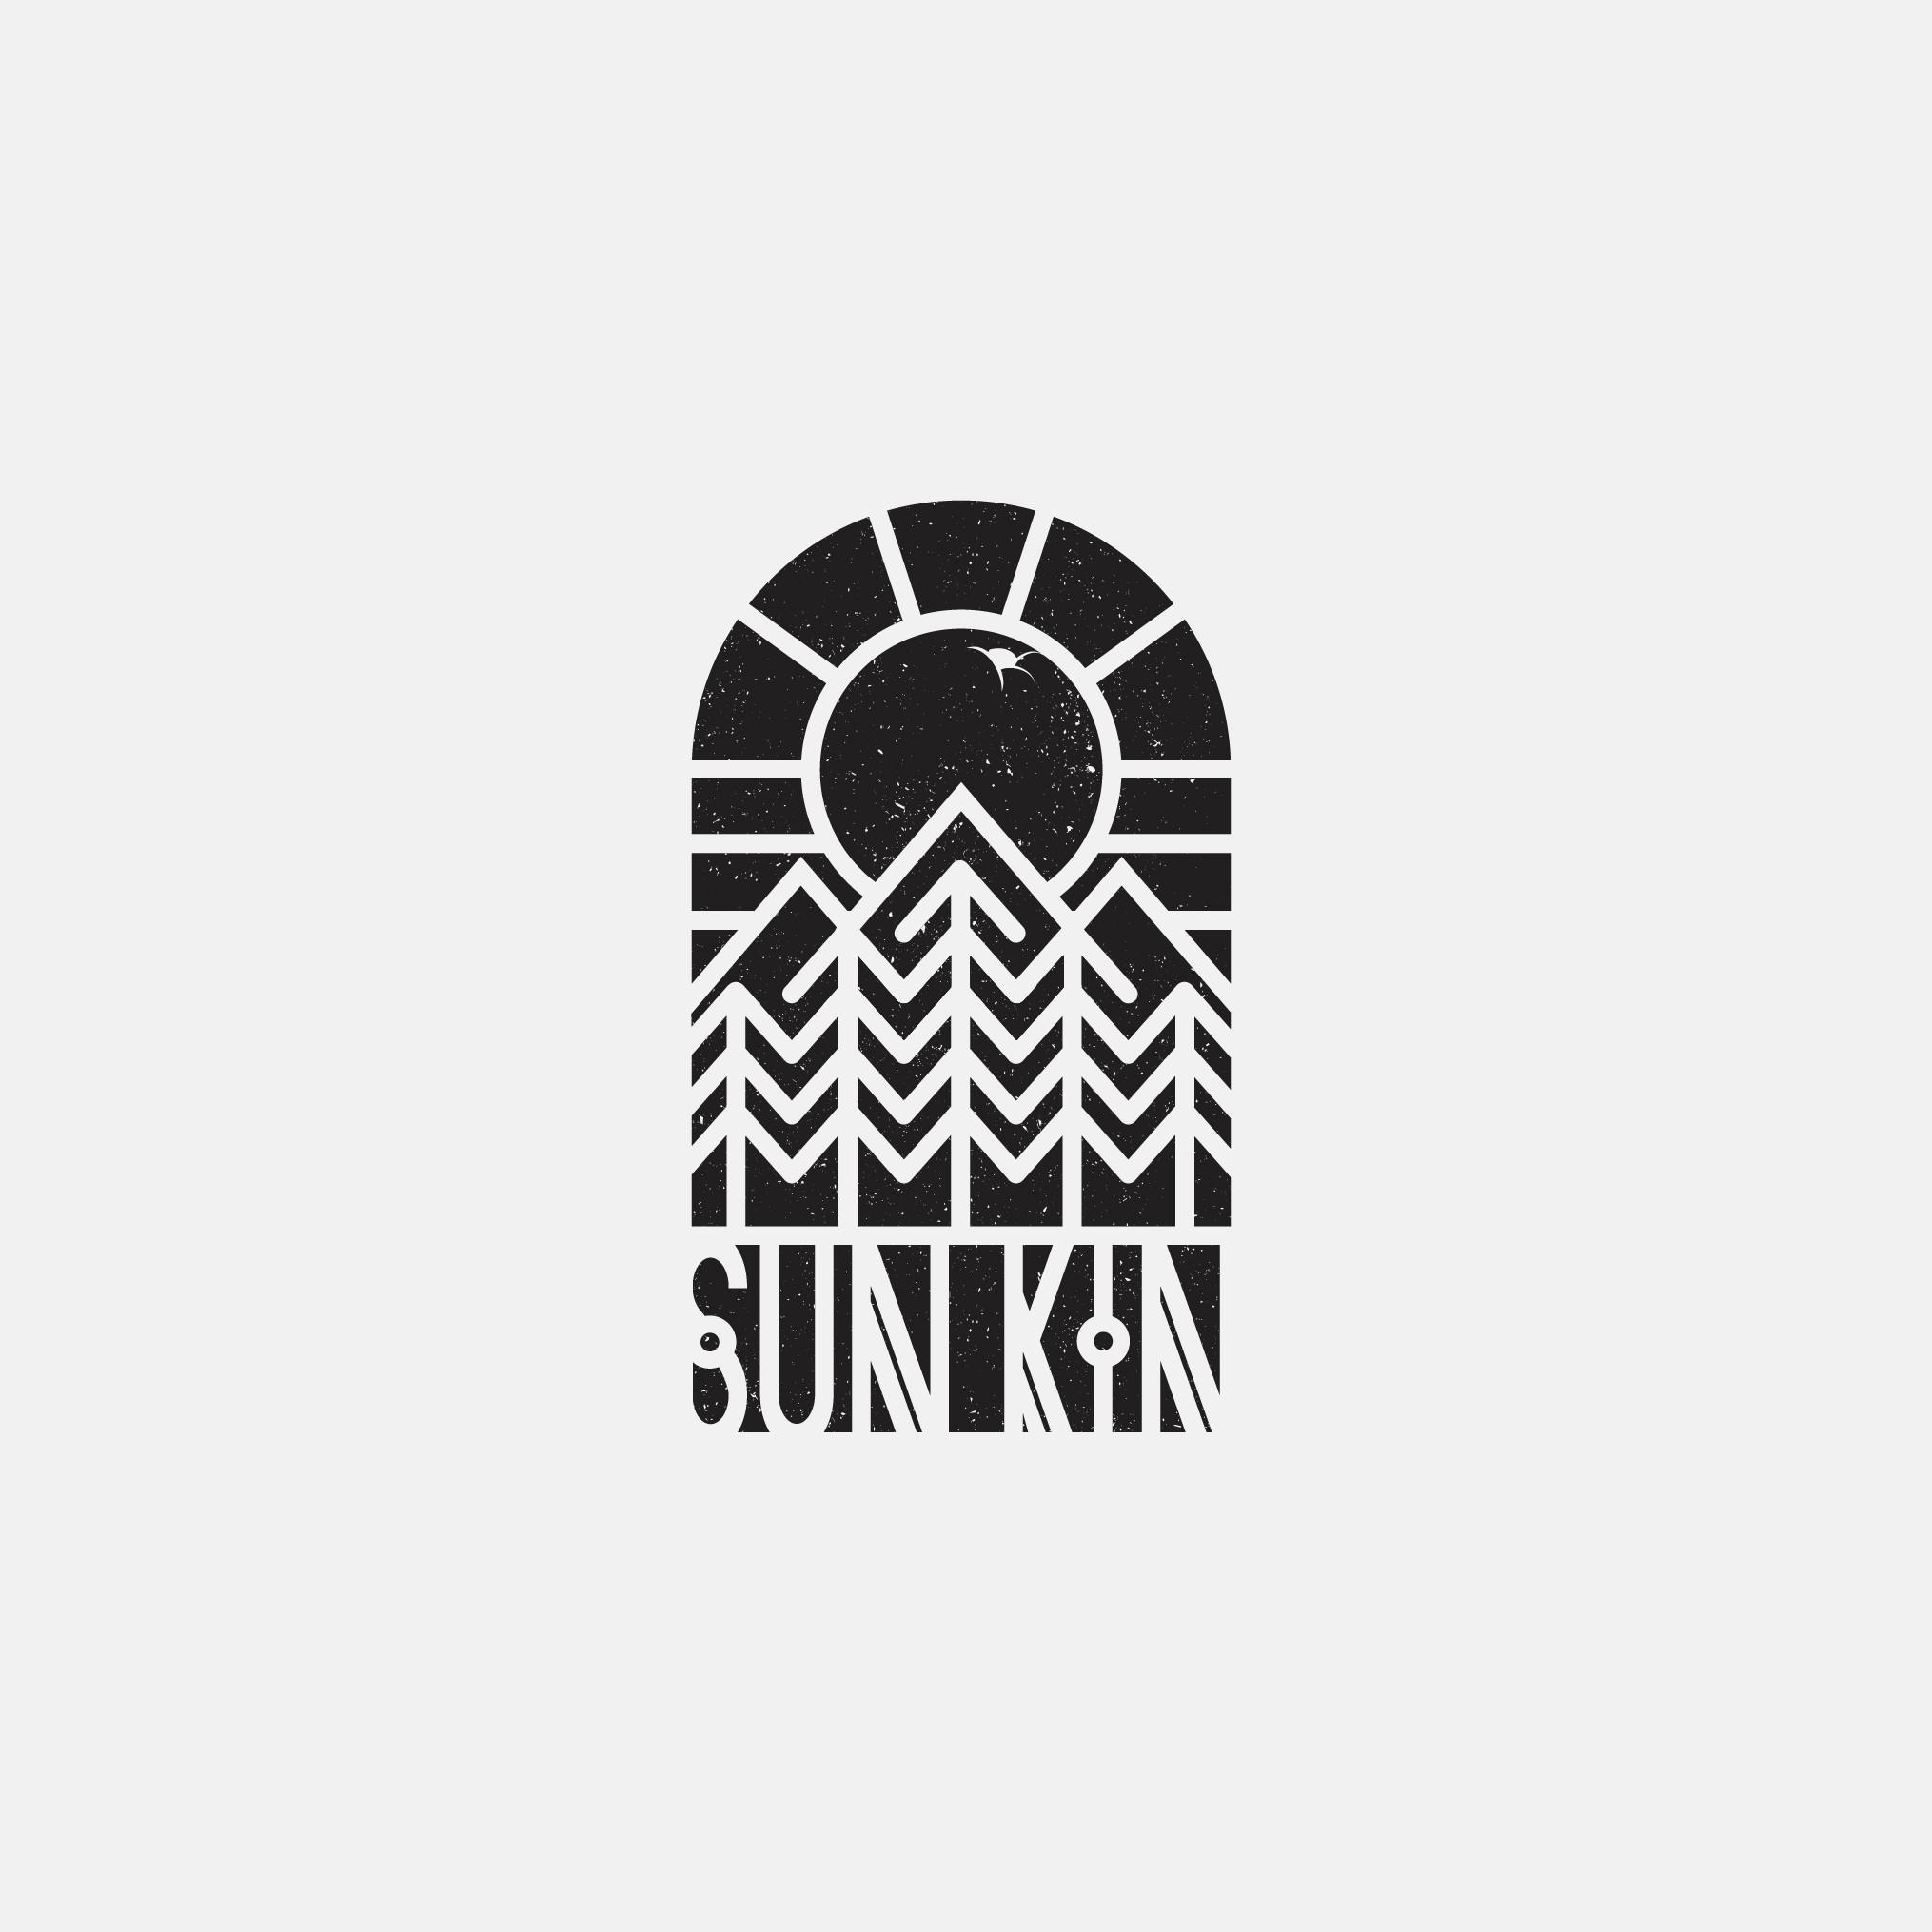 Modern, Organic, Lush Logo for Psych Folk/Rock Band from Bay Area